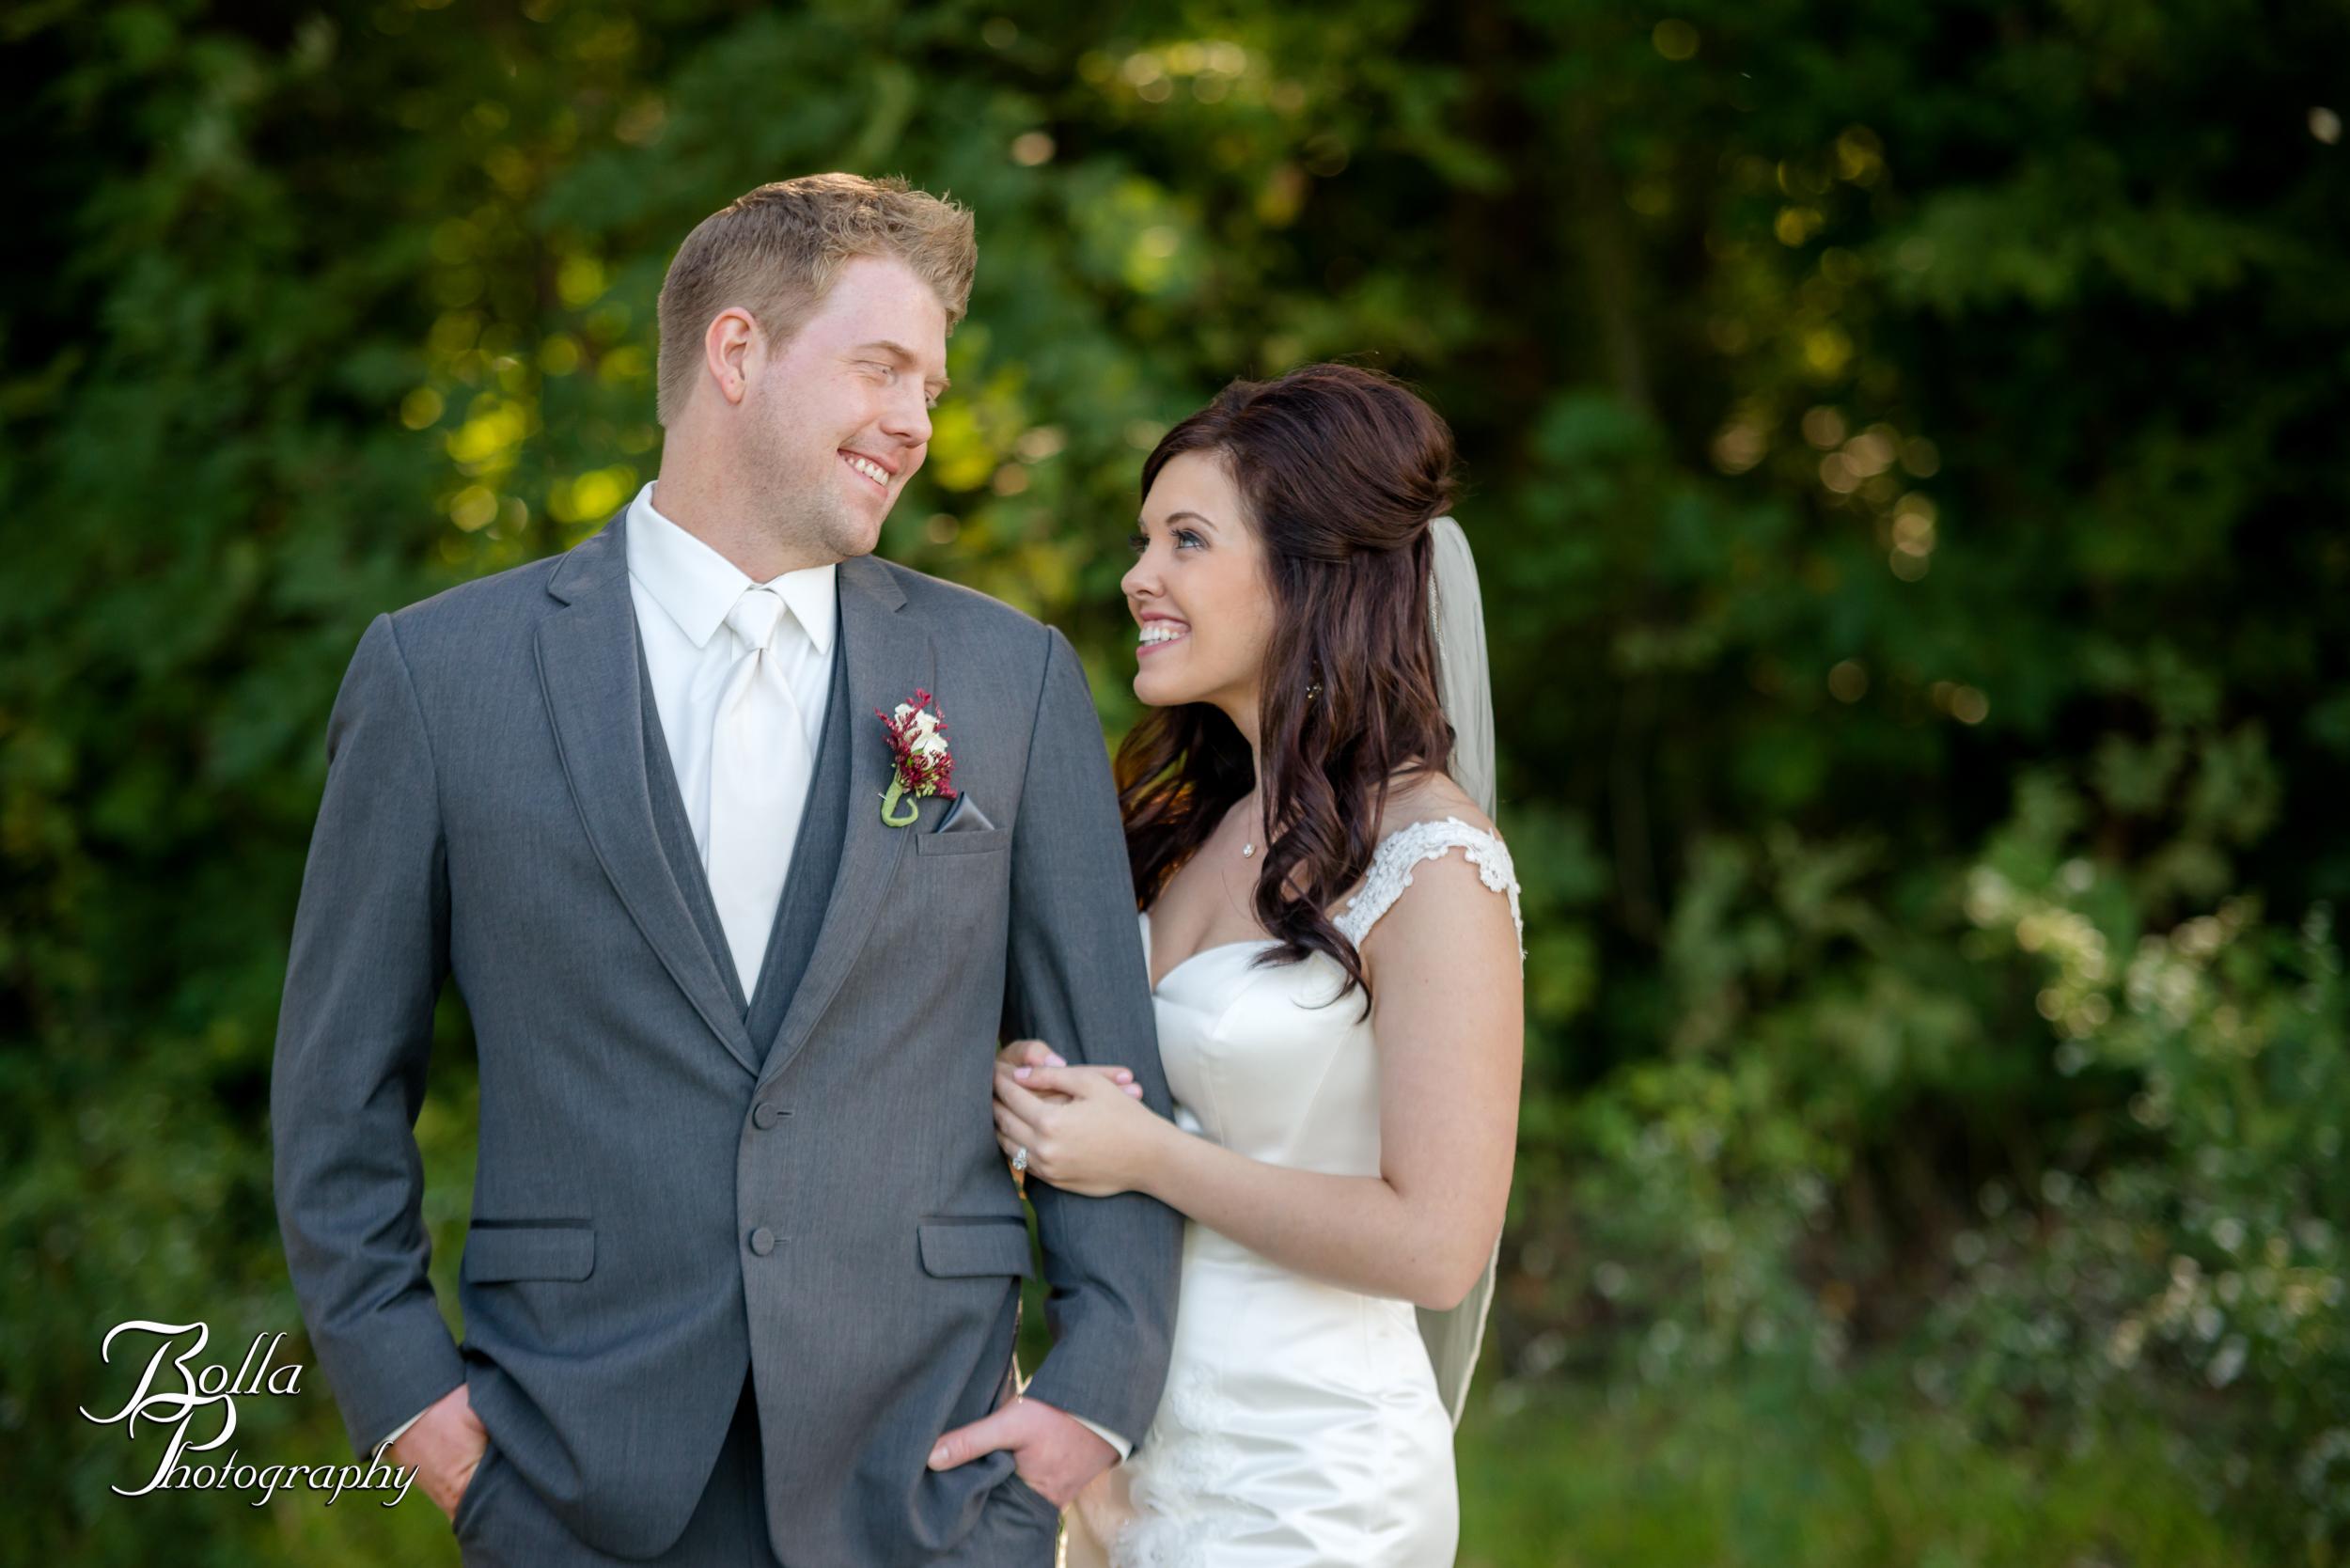 Bolla_photography_edwardsville_wedding_photographer_st_louis_weddings_Reilmann-0002.jpg